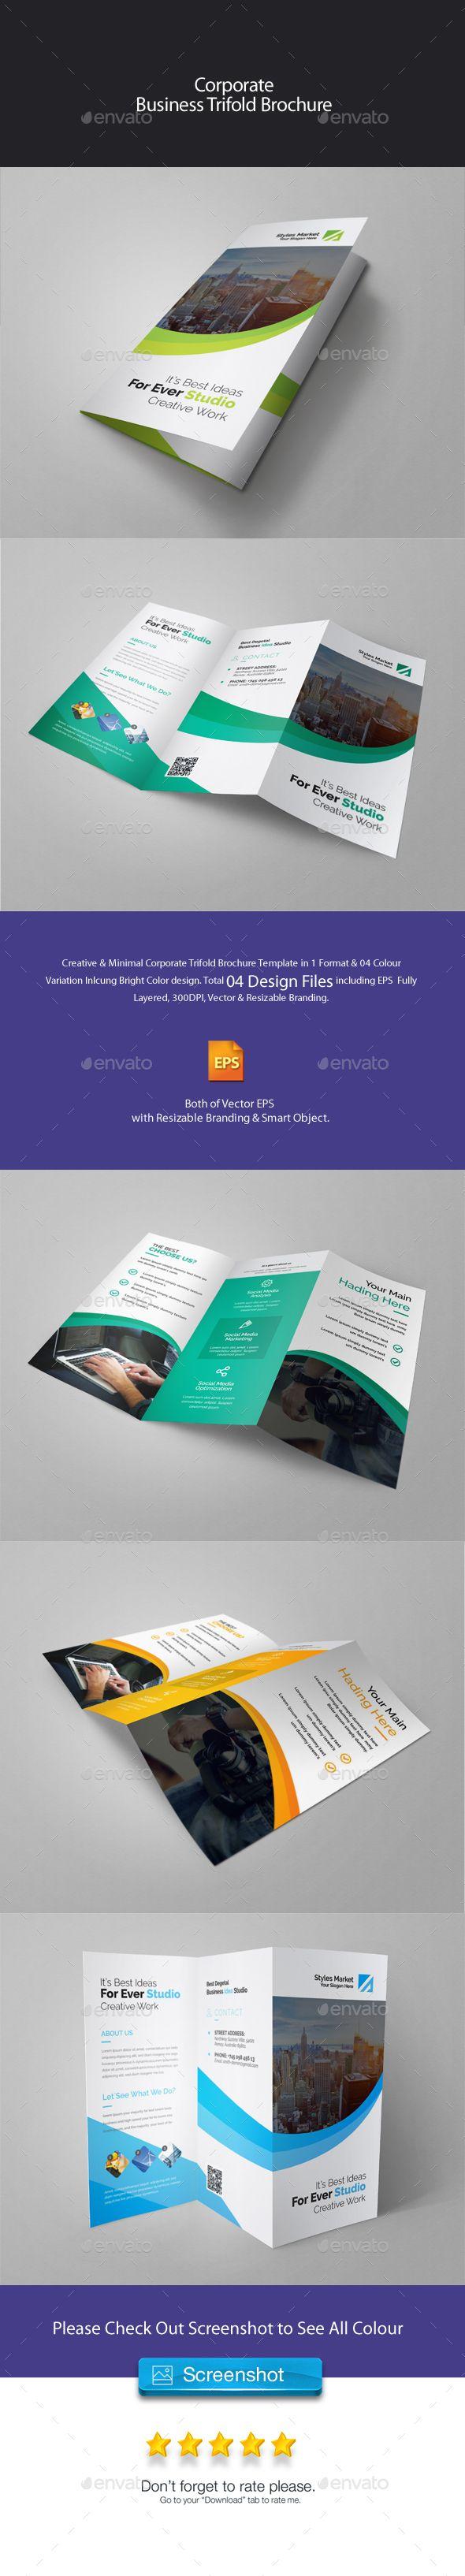 corporate trifold brochure corporate trifold brochure 11 69 8 27